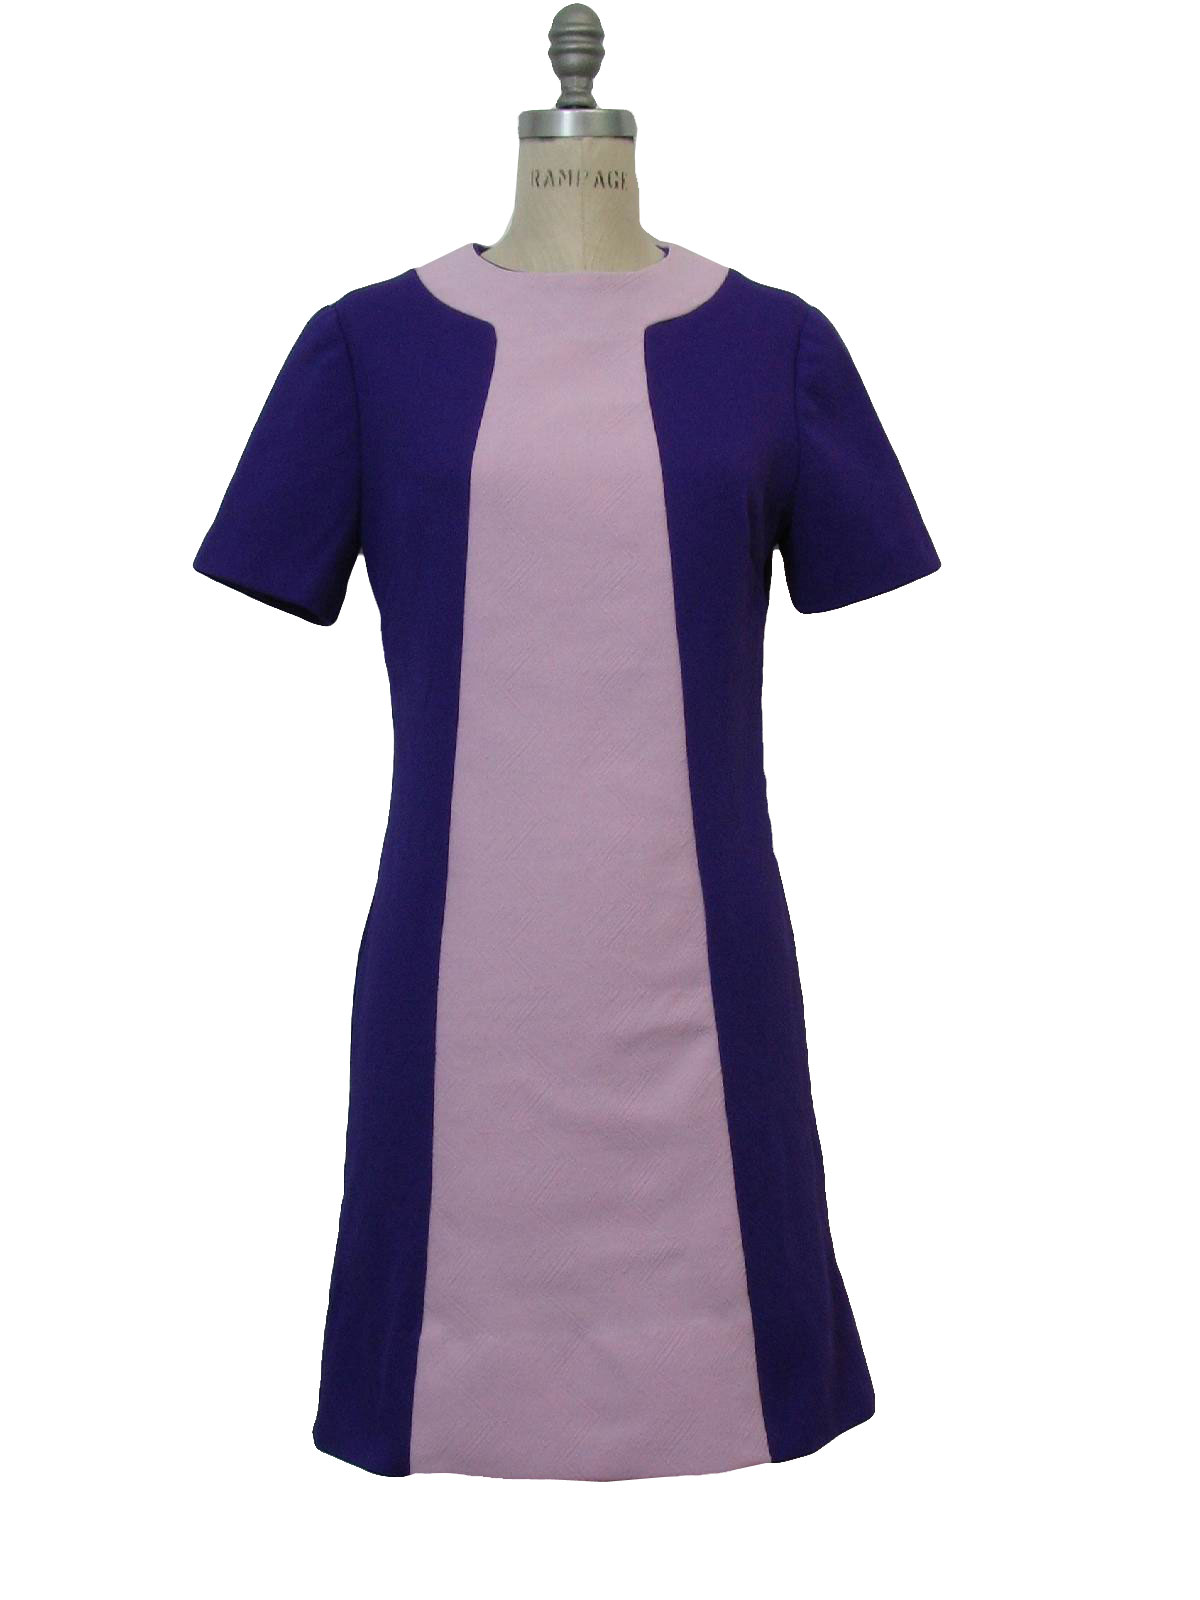 1960 S Vintage Missing Label Dress Late 60s Missing